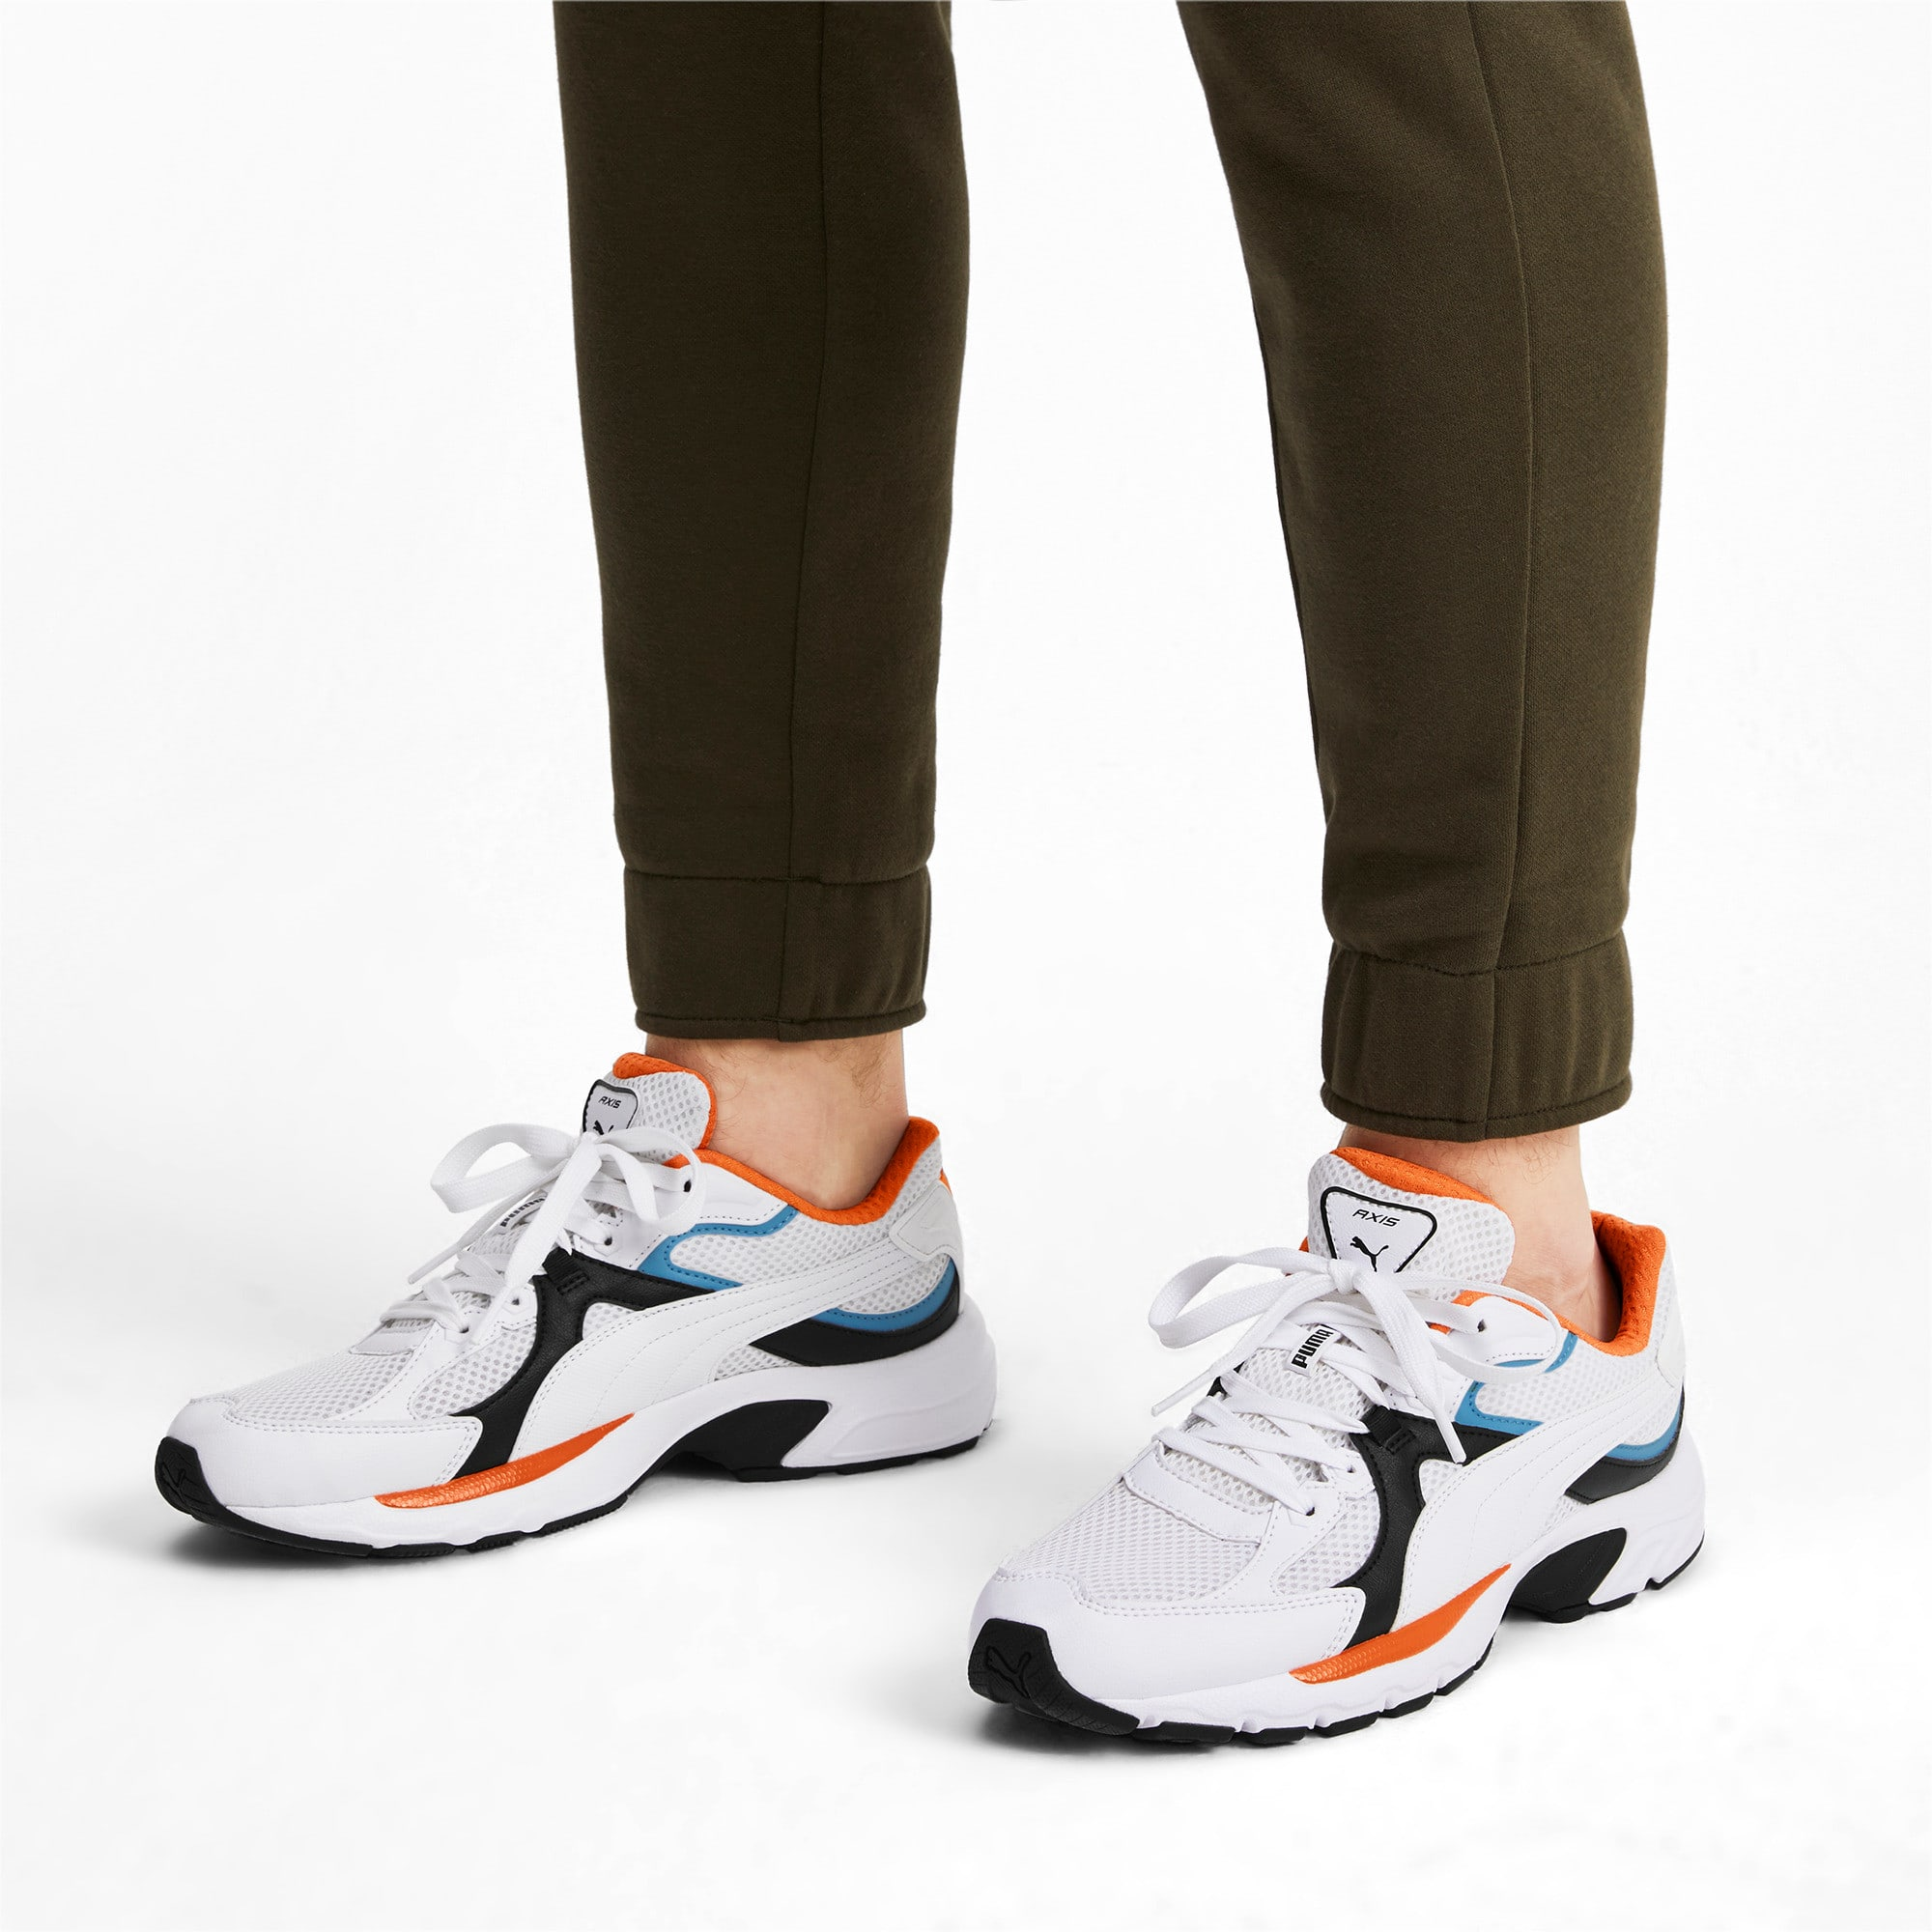 Thumbnail 2 of Axis Plus 90s Sneakers, White-Blk-T Lt Blue-J Orange, medium